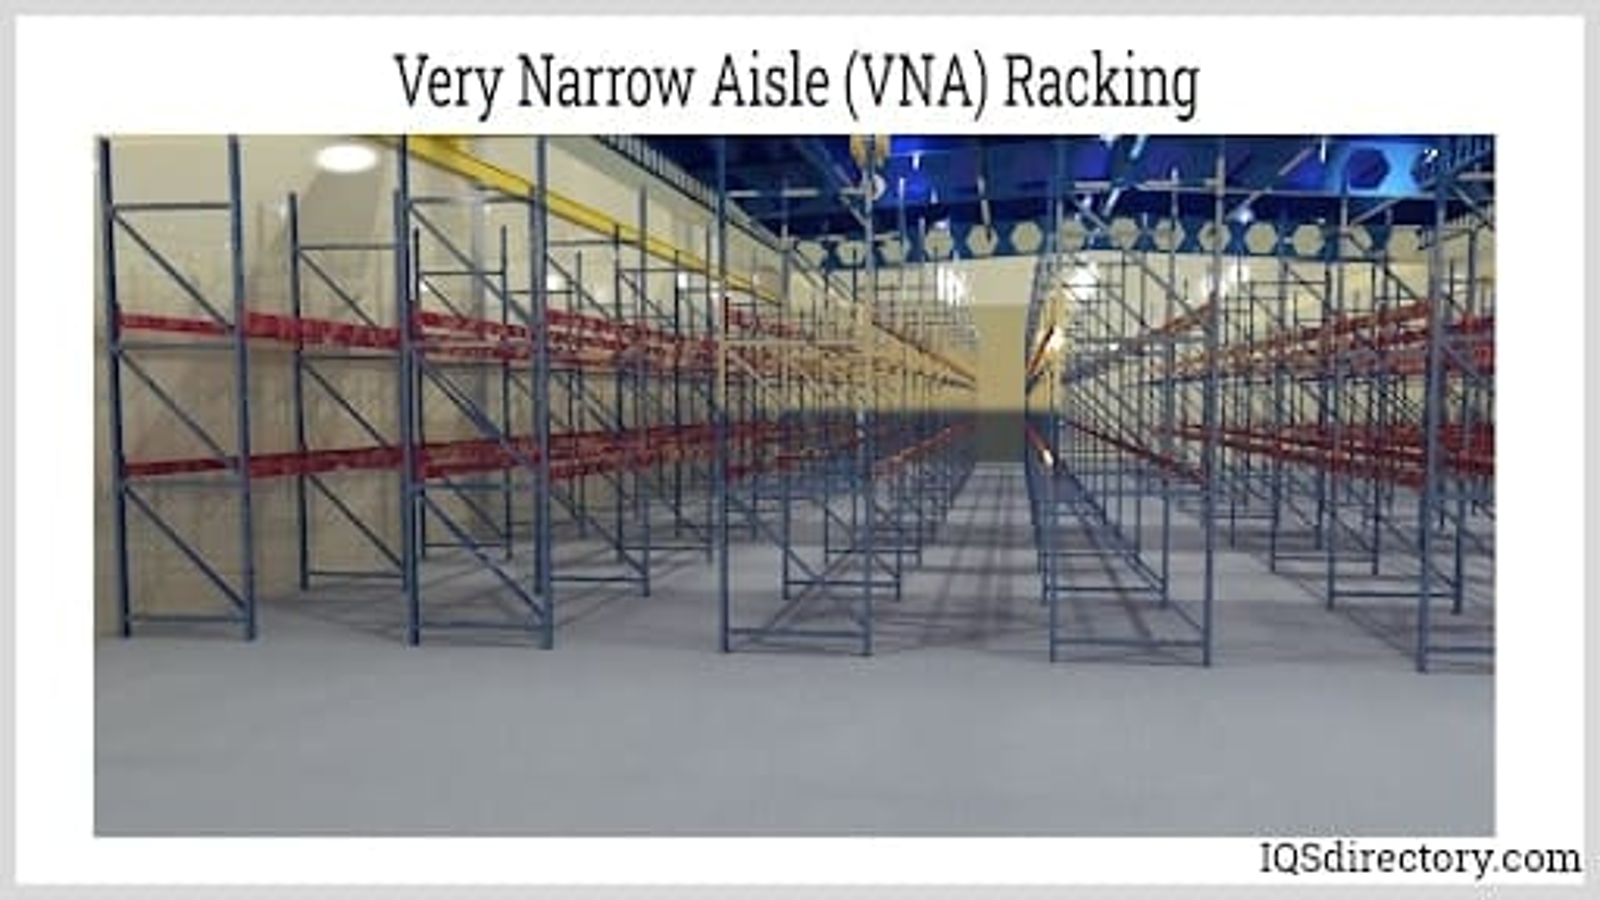 Very Narrow Aisle (VNA) Racking